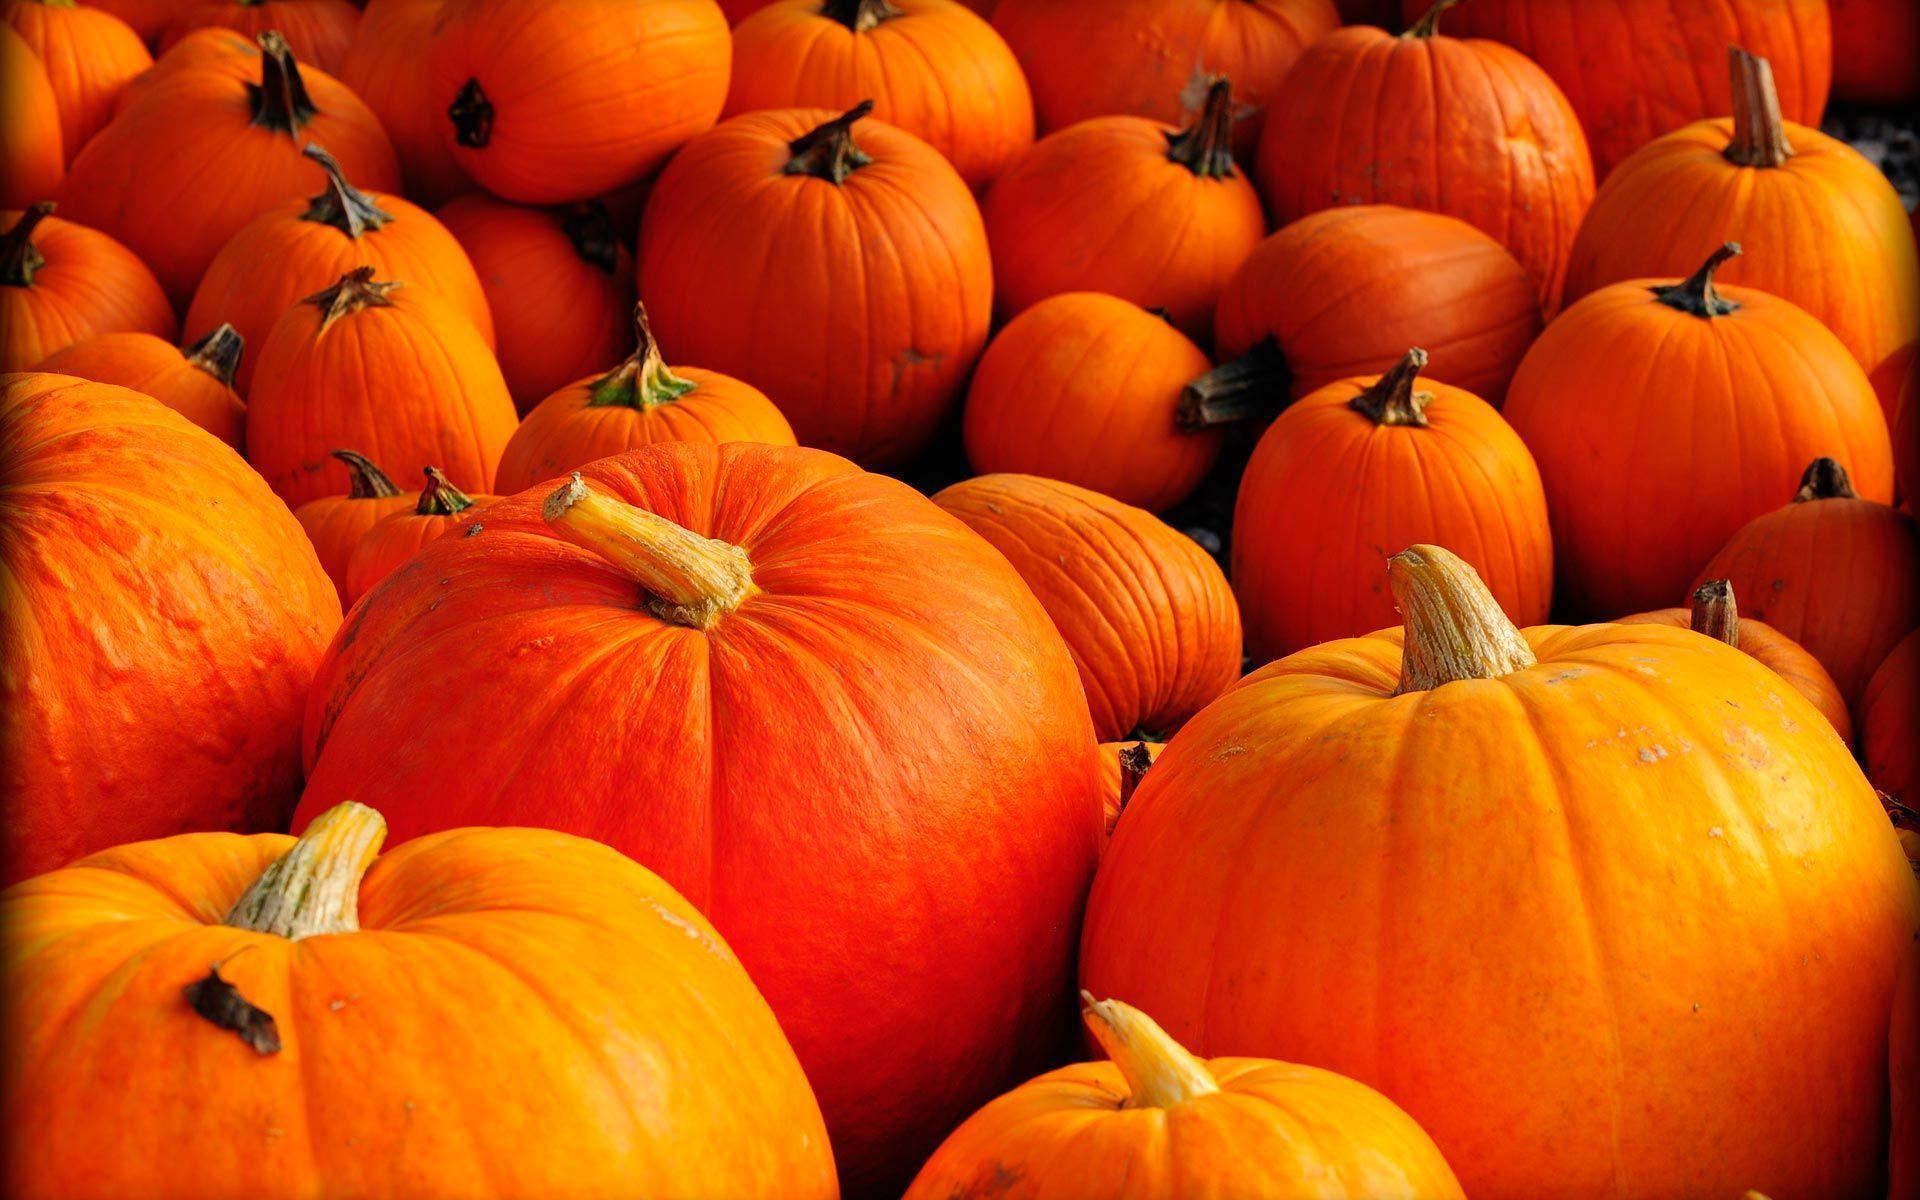 Pumpkins Wallpapers